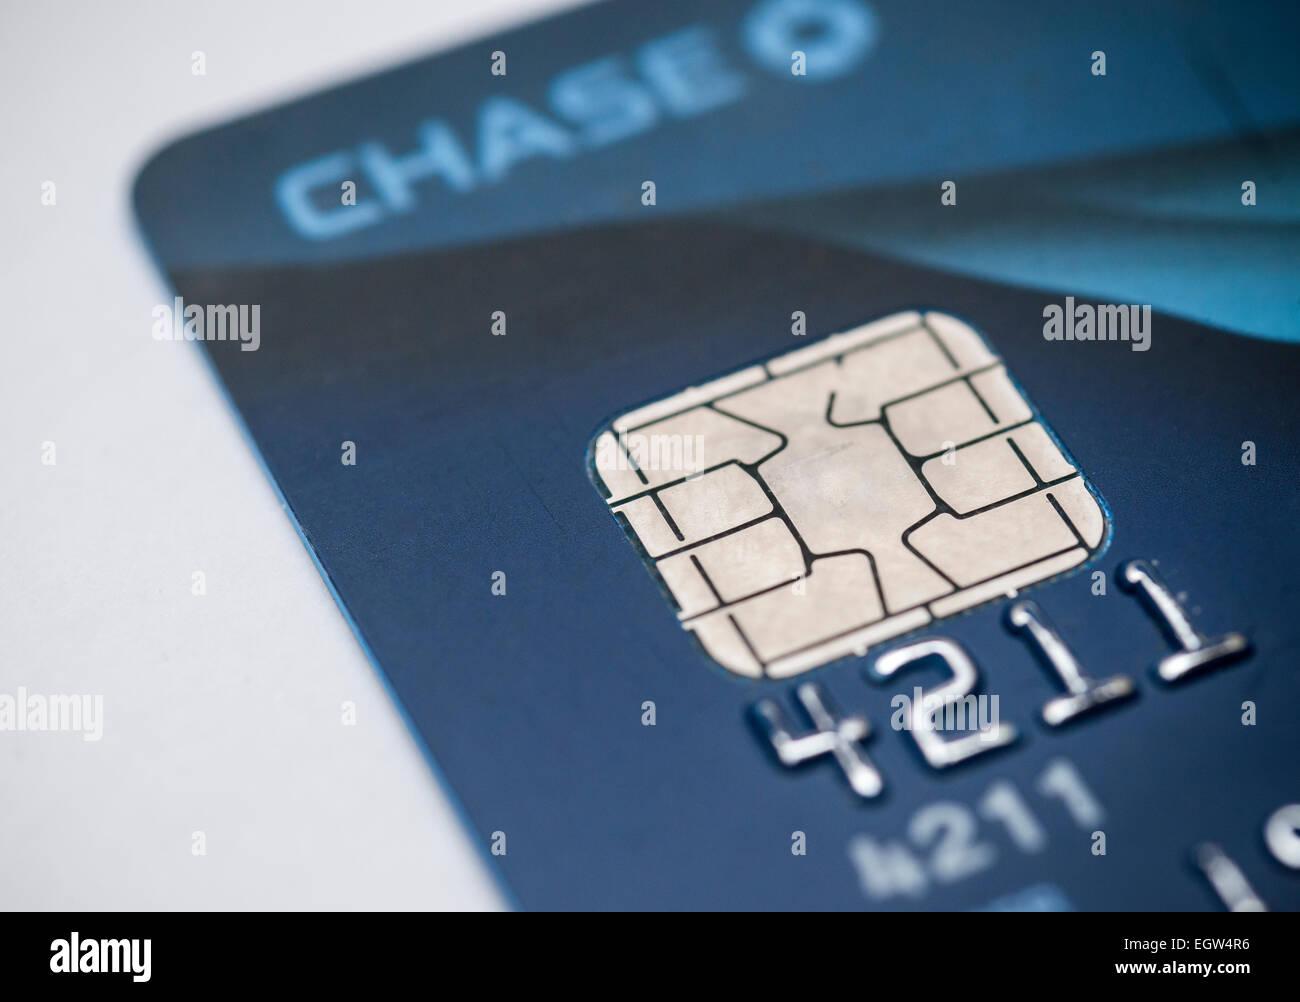 Jp morgan corporate credit card payment images card design and jp morgan corporate credit card payment image collections card jp morgan corporate credit card payment gallery reheart Image collections